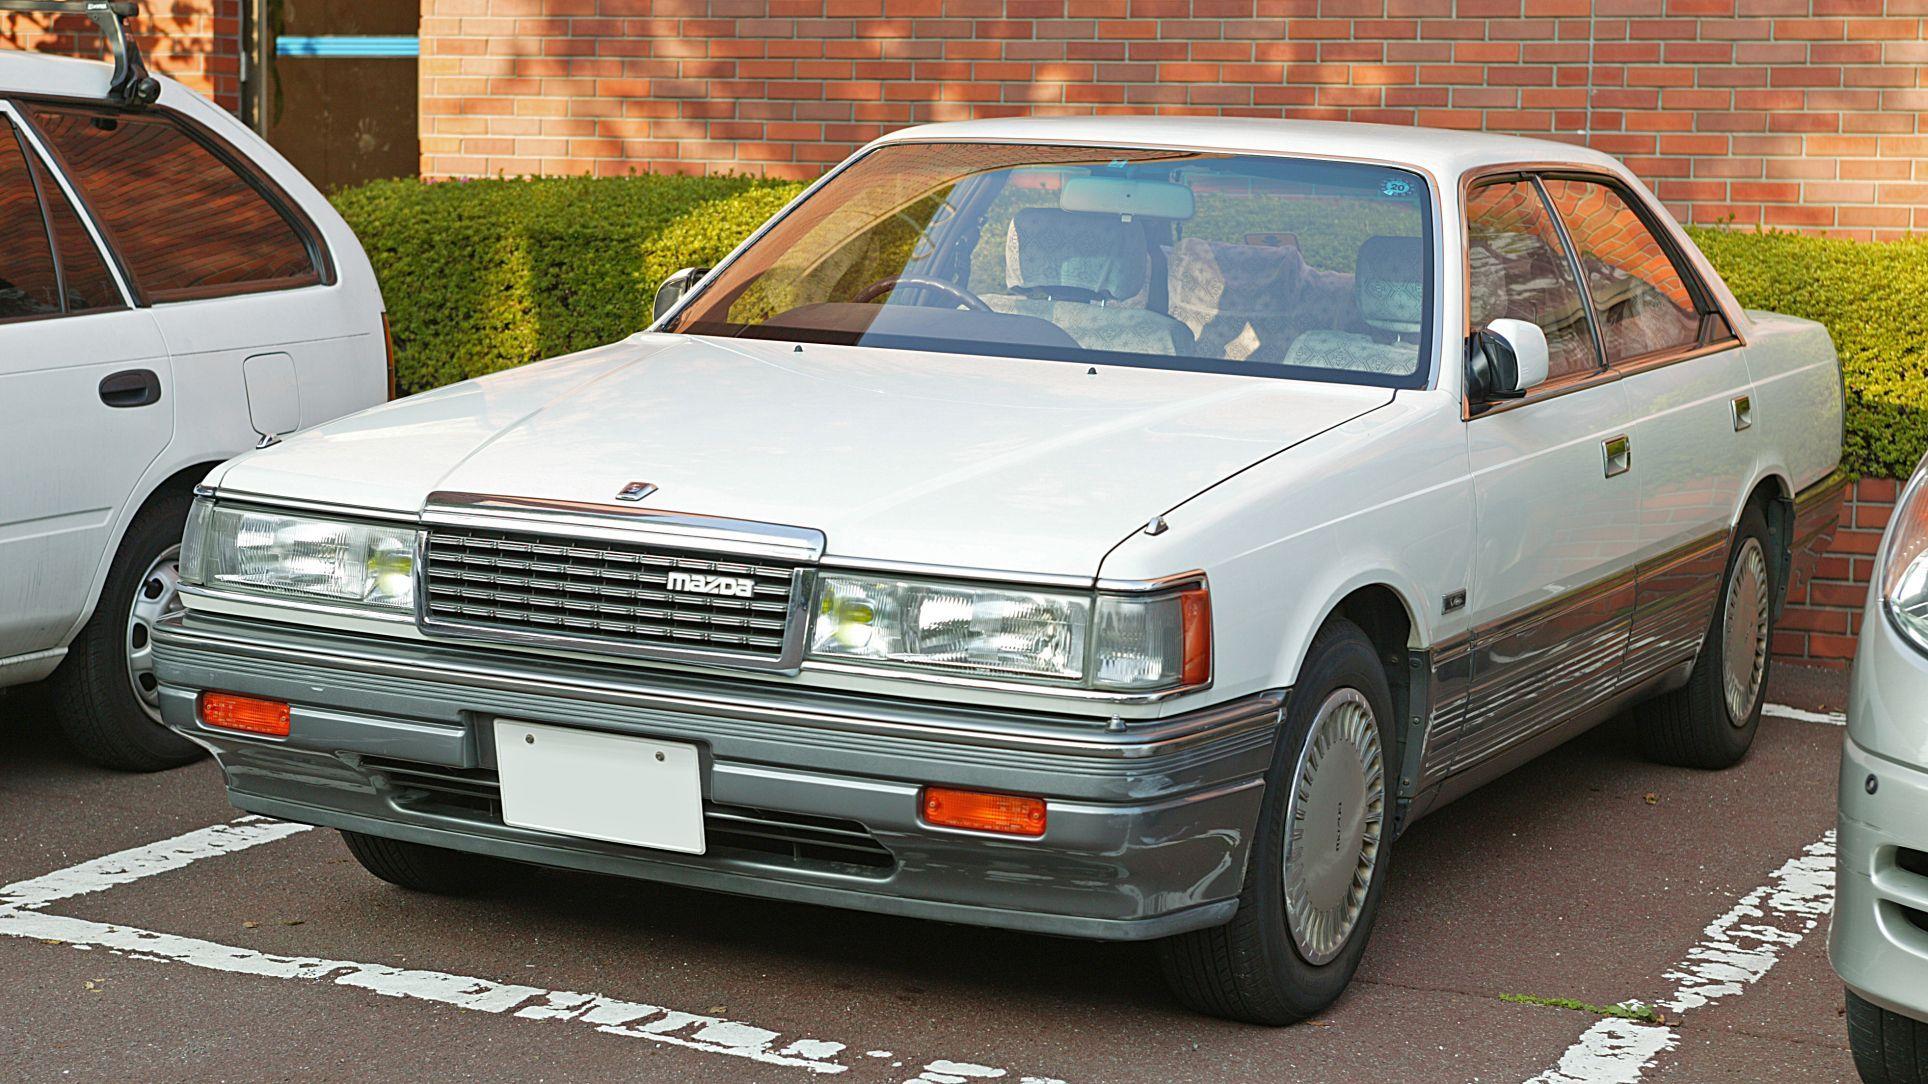 Mazda wis (19822004) Mazda Service Repair